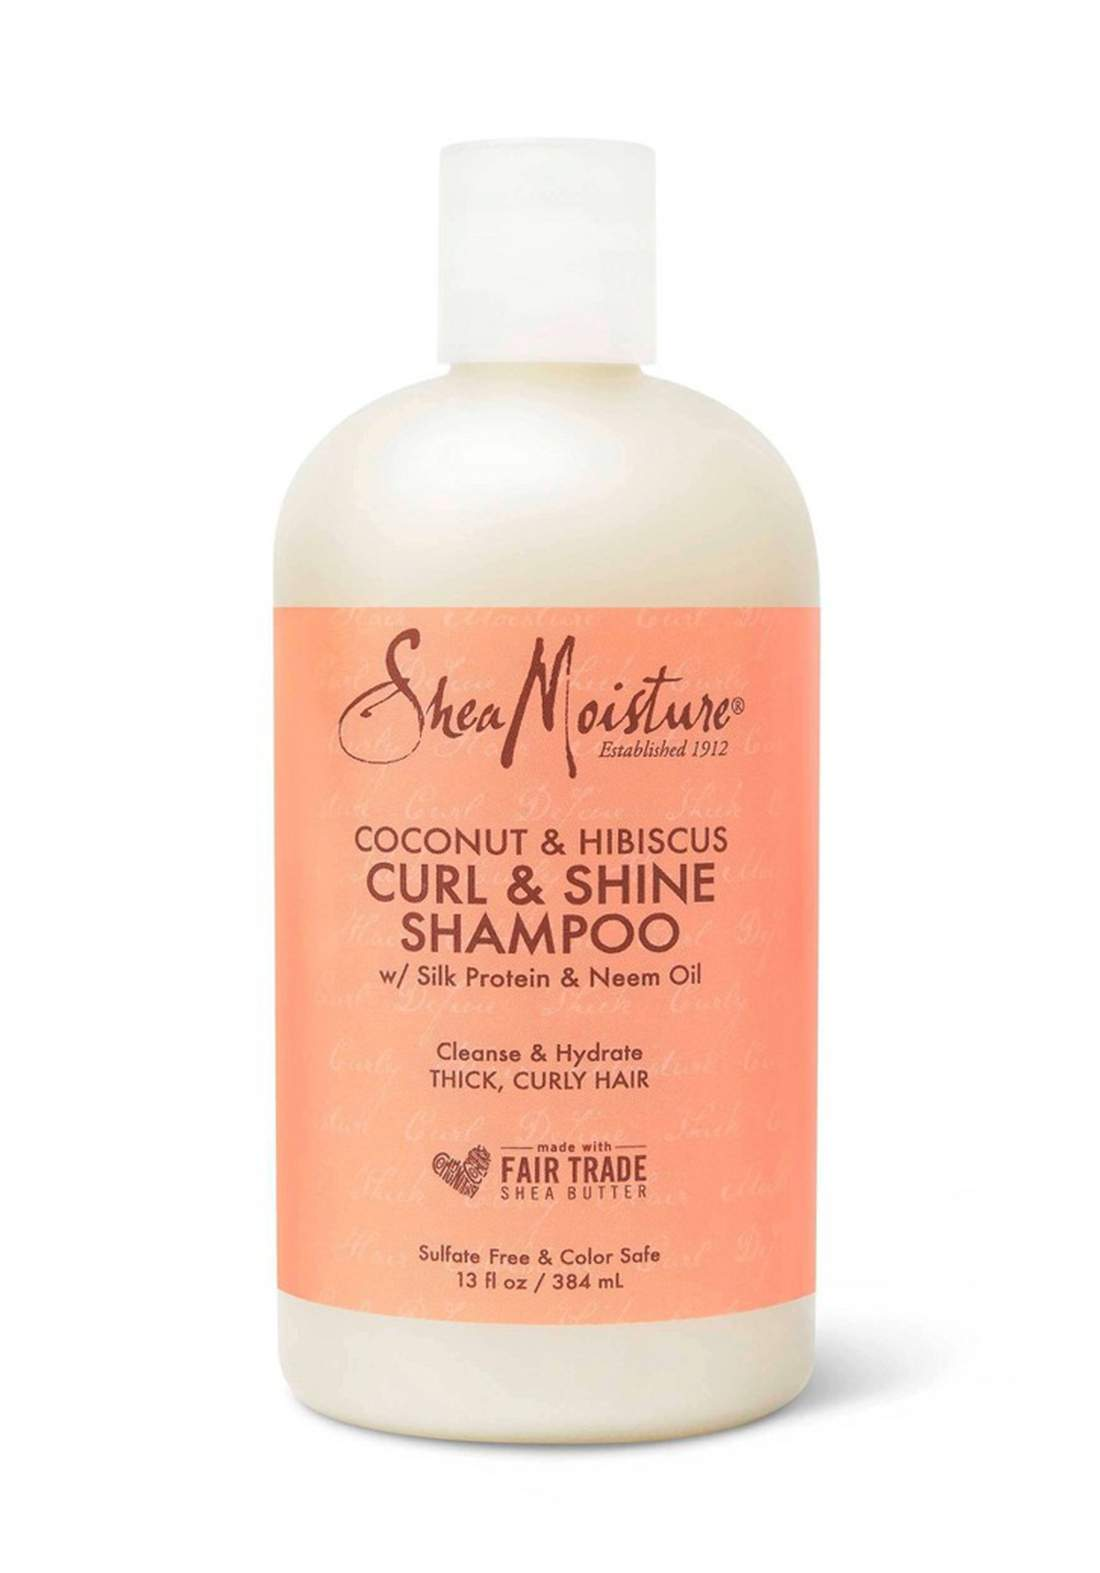 Shea Moisture Coconut & Hibiscus Curl & Shine Shampooشامبو